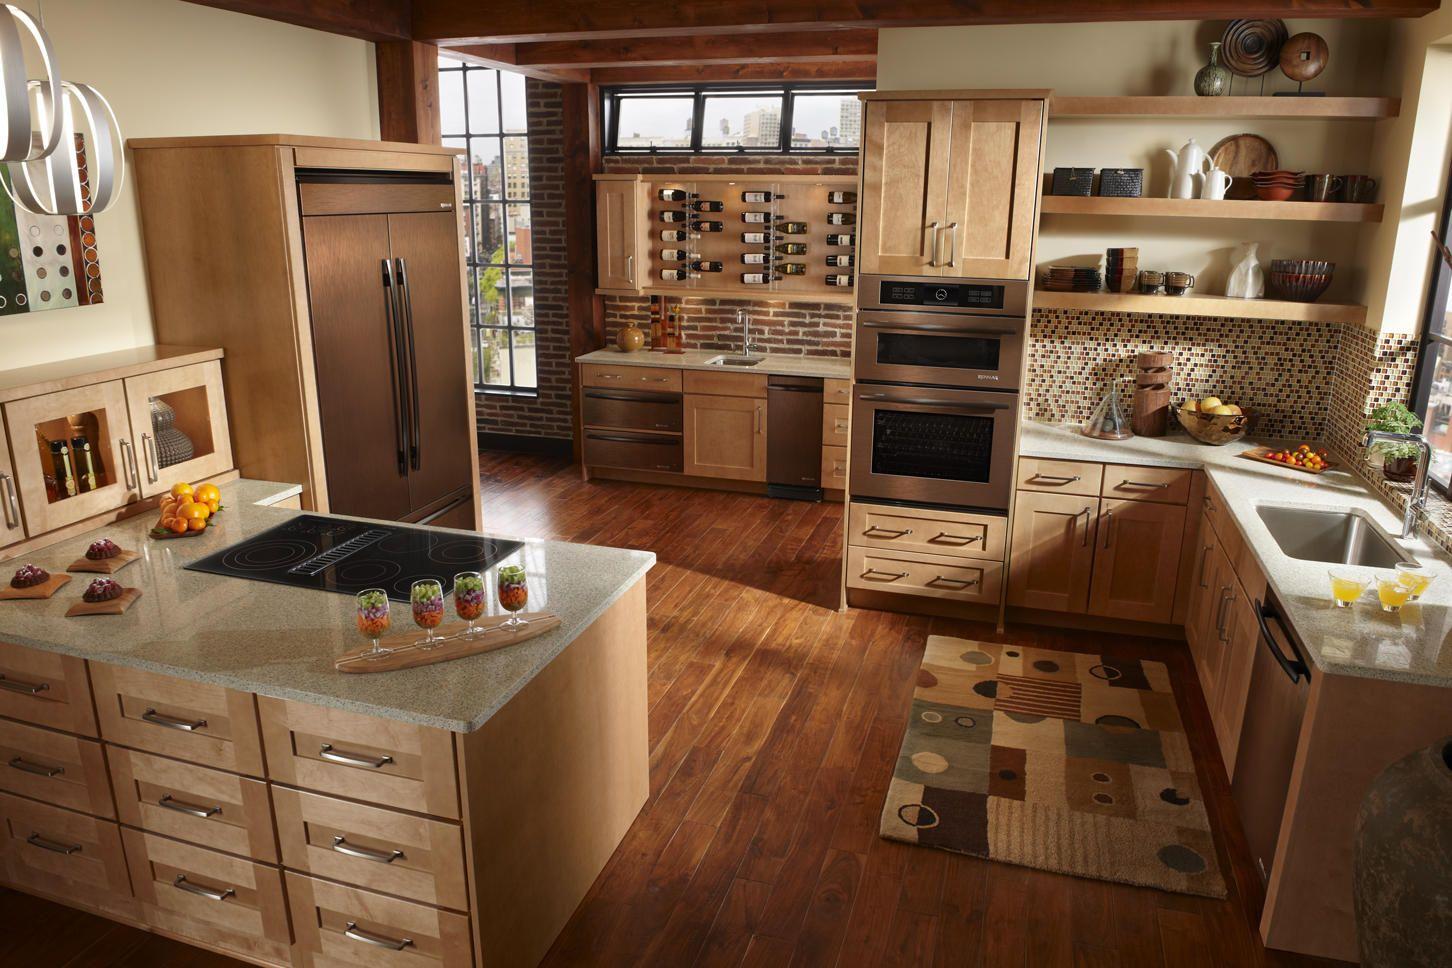 Bronze Kitchen Appliances Vineyard Decor Toni Pinterest And